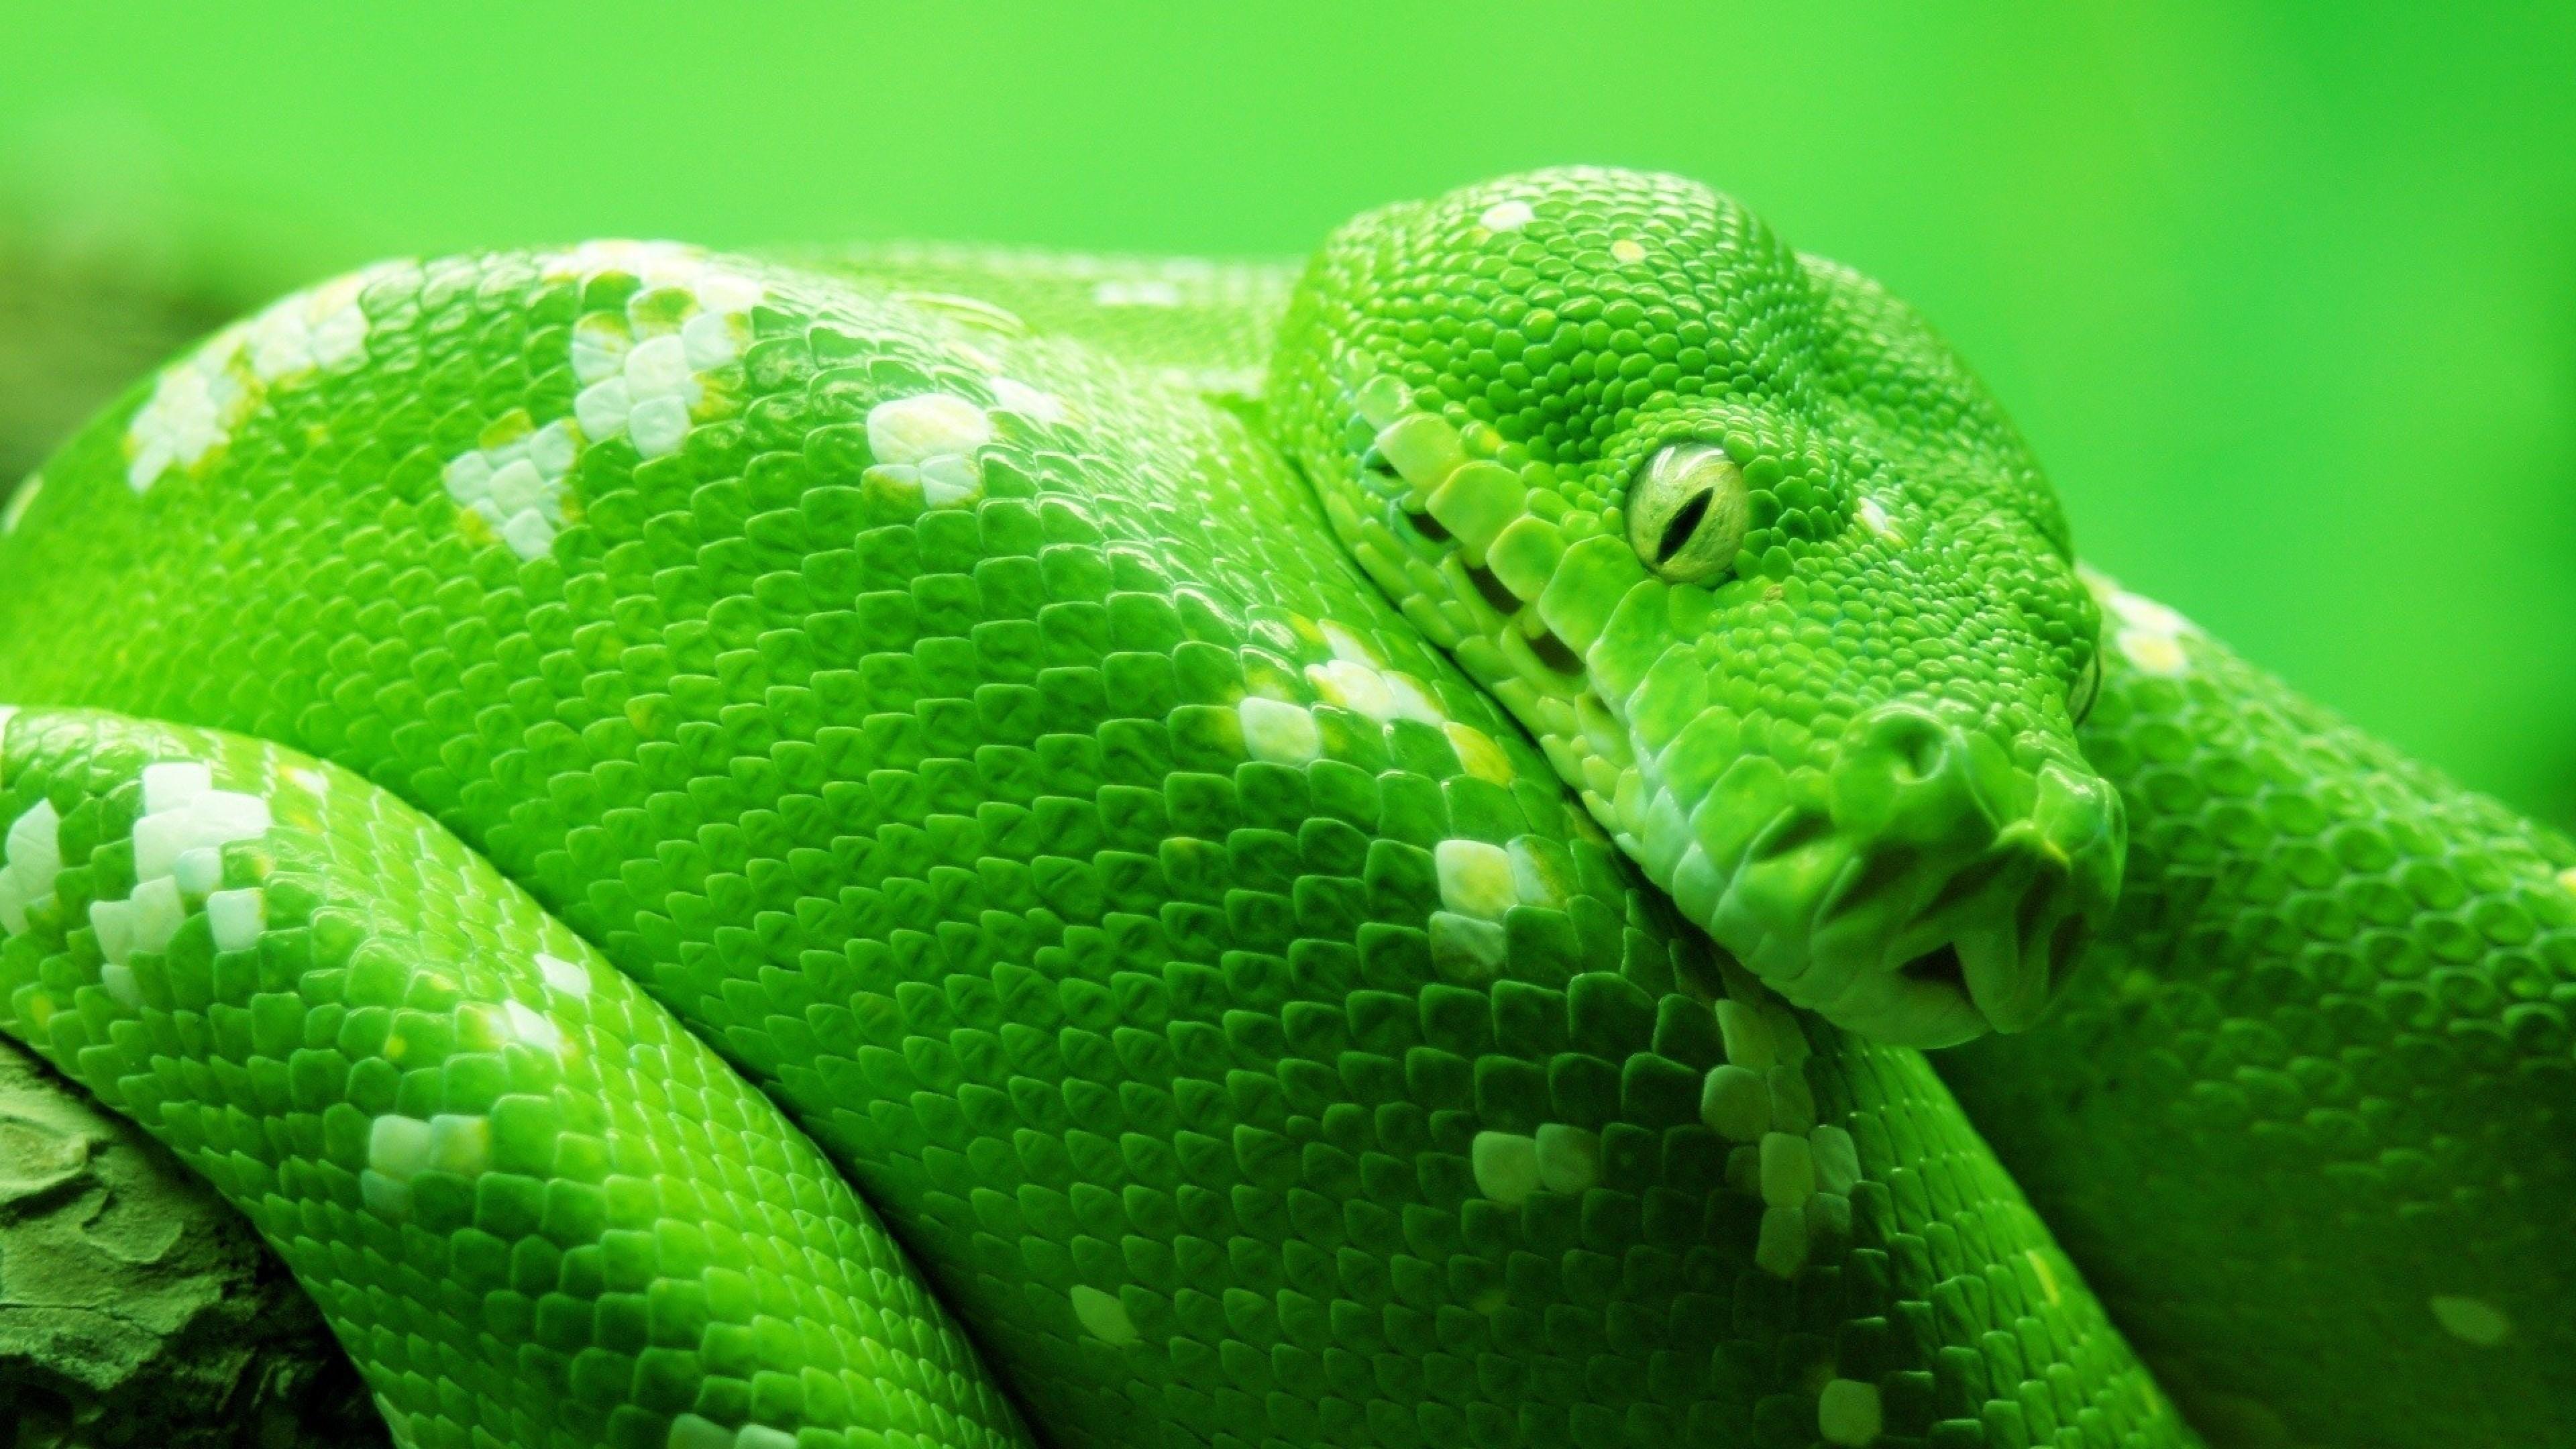 Ios Live Wallpaper Iphone X Wallpaper Snake Green 4k Animals 14978